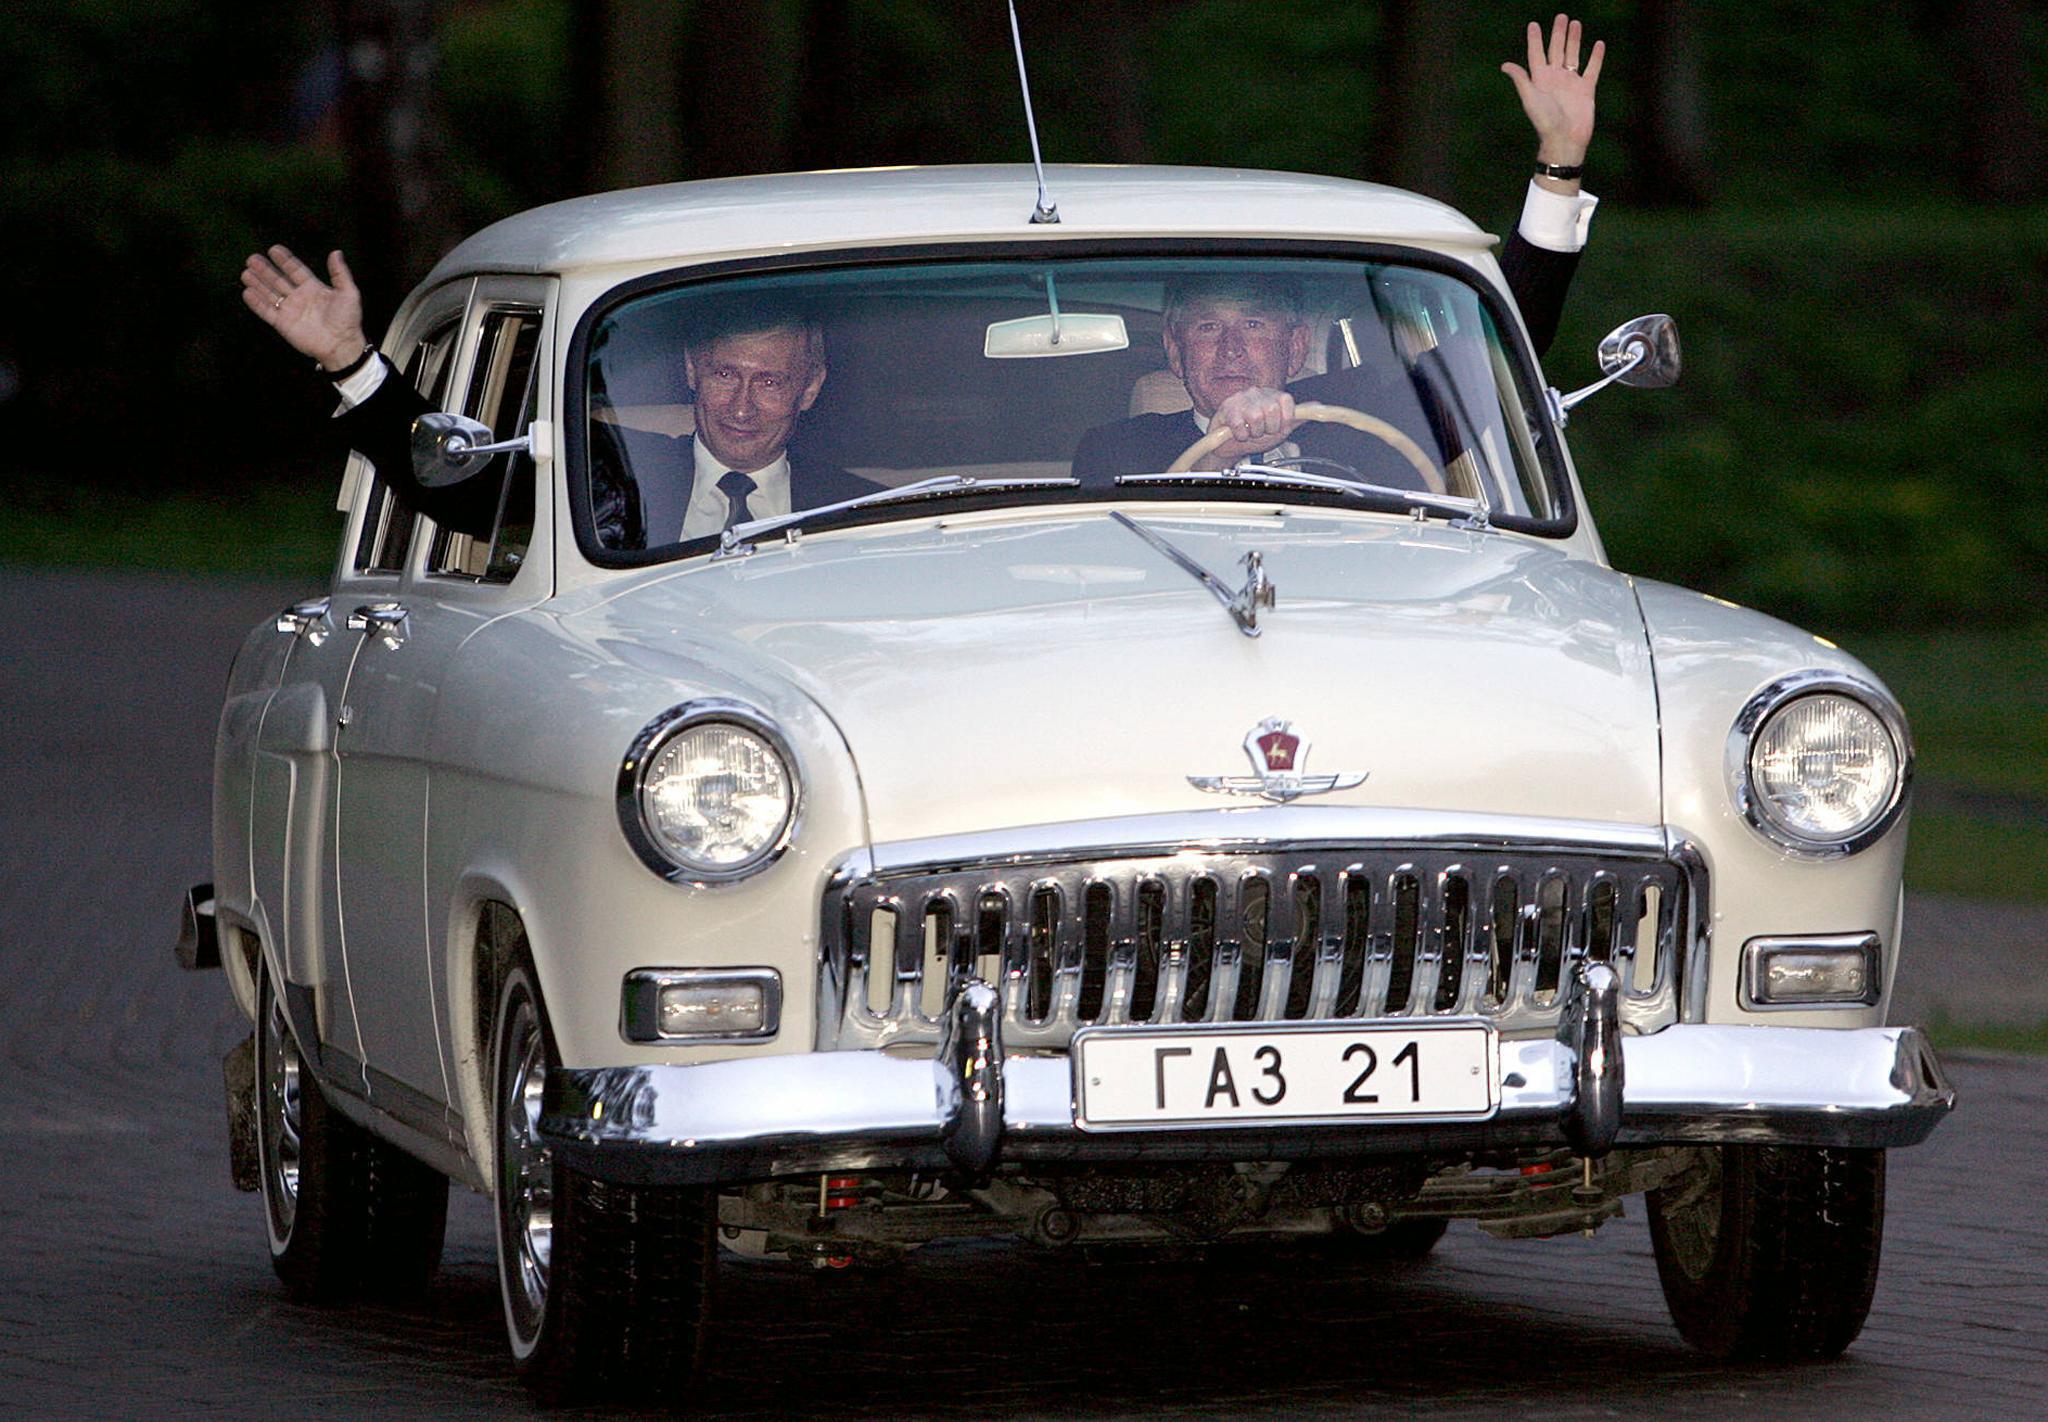 Владимир Путин иДжордж Буш-младший  едут на